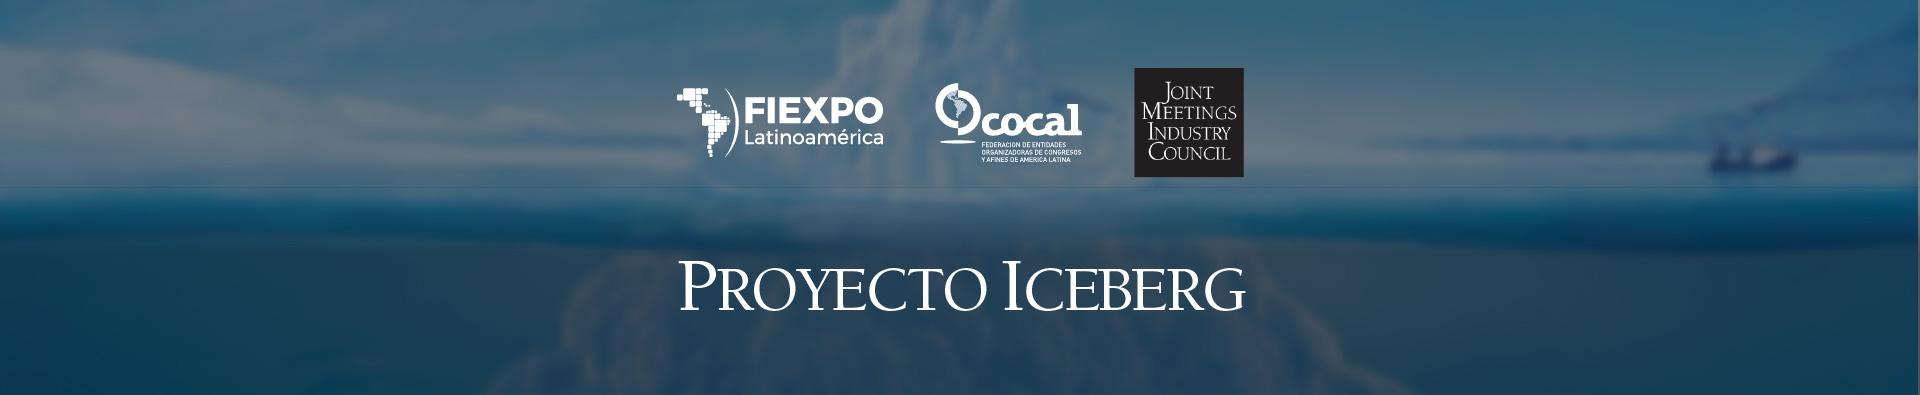 proyecto-iceberg-banner-es